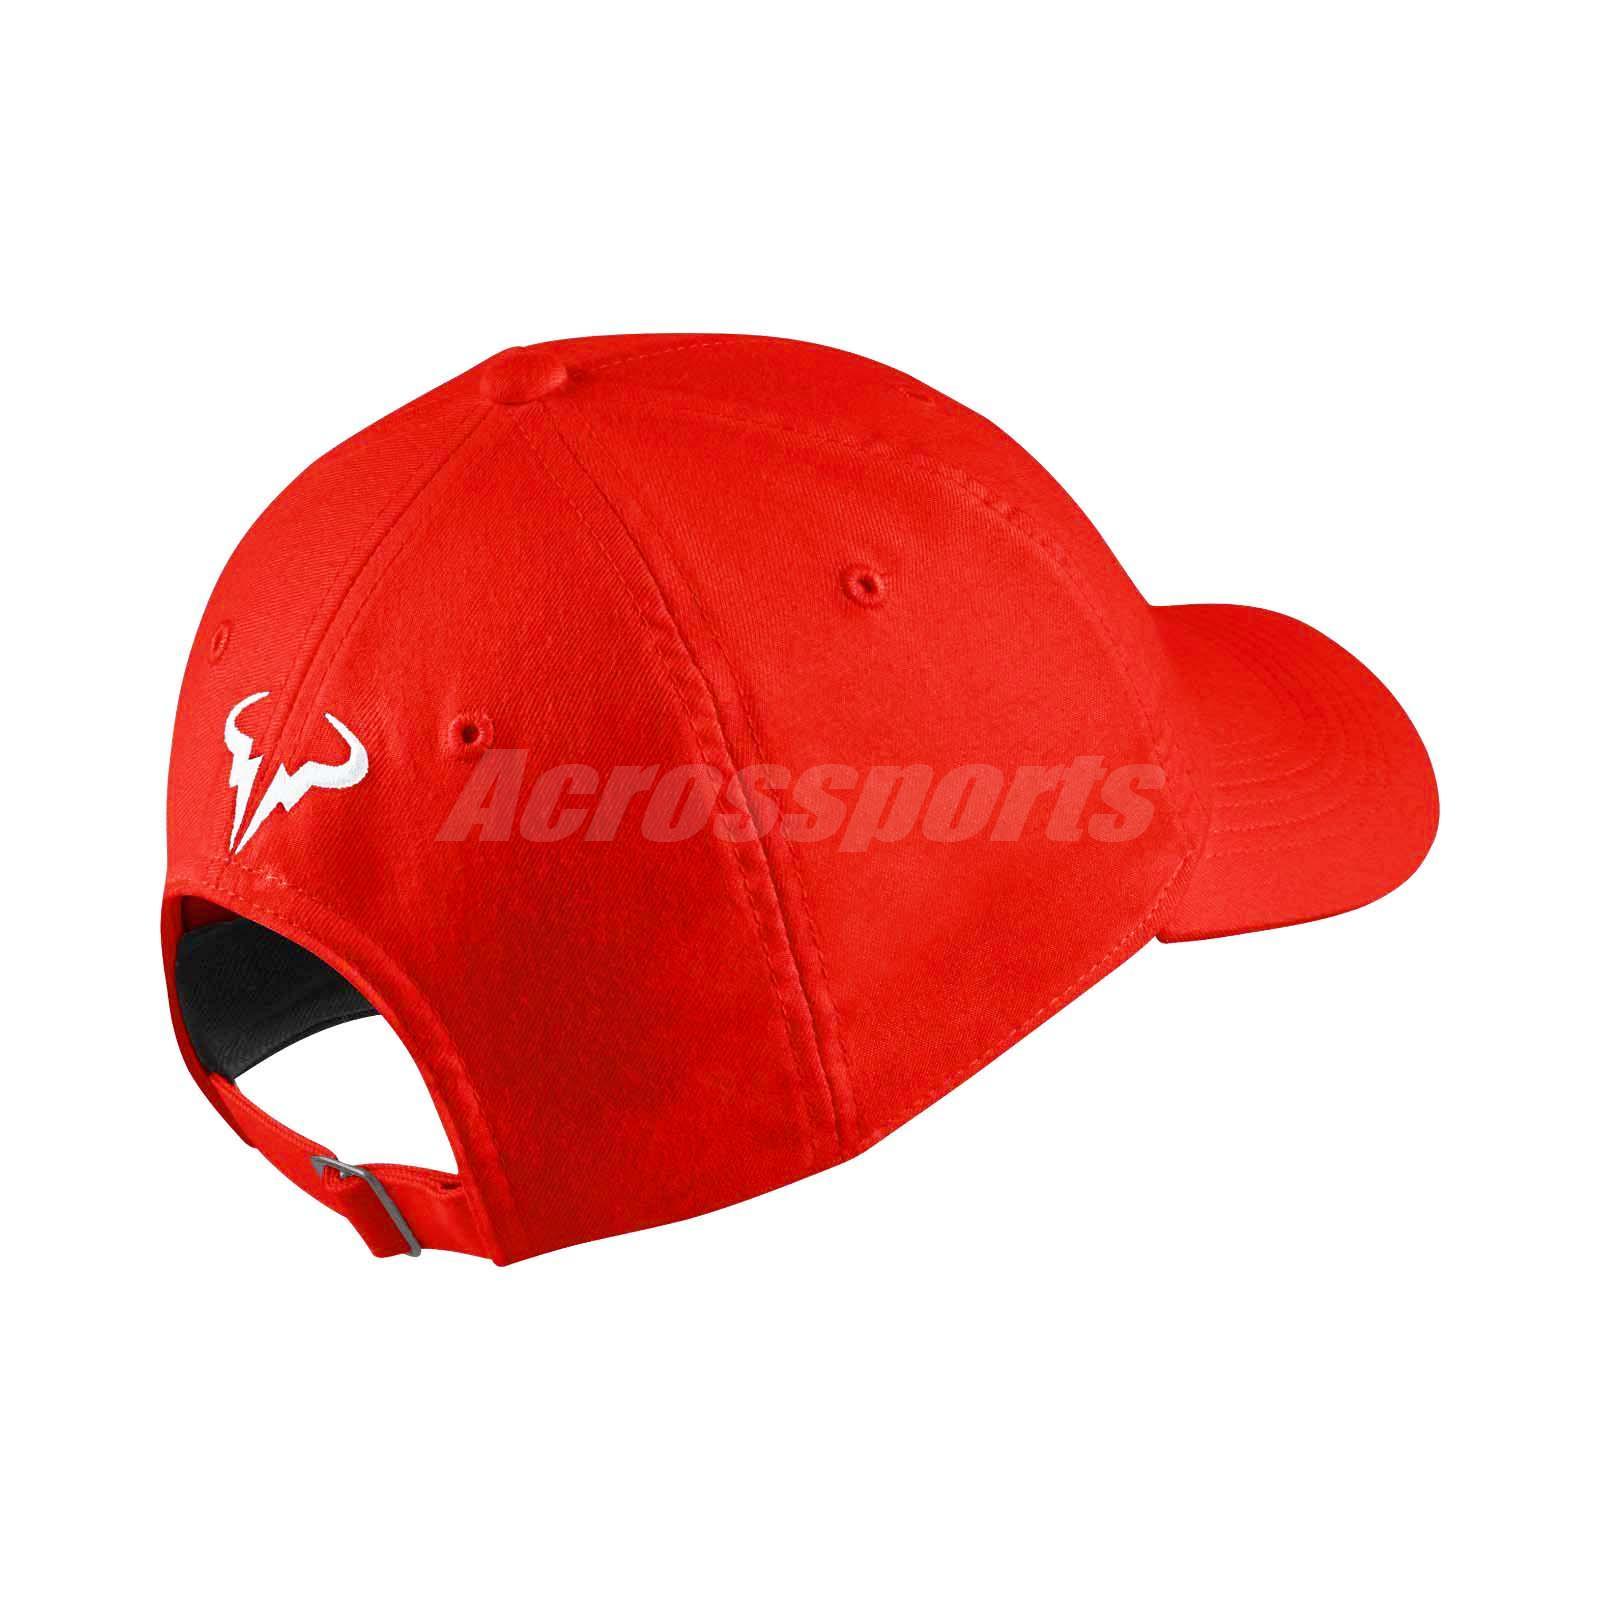 890bfa856c5 Nike Court Aerobill Nadal Heritage 86 Tennis Hat Cap Navy Racquet NWT  850666-081